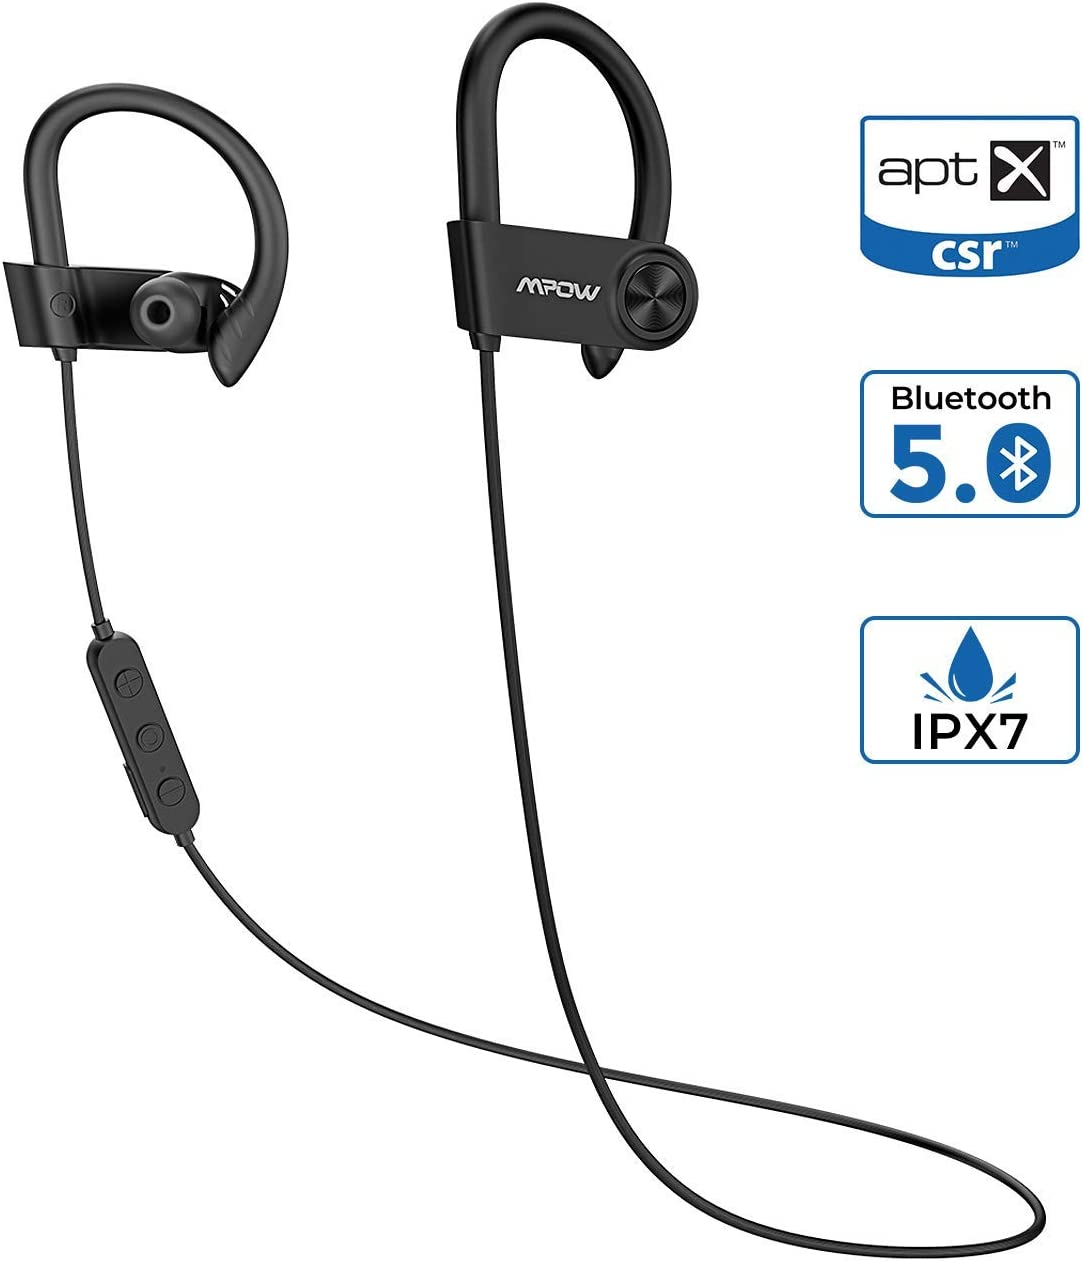 【Nueva versión】 Mpow D9 Auriculares Bluetooth 5.0 Bass +, 16-18 Horas de Juego, aptX IPX7 Deportivos Inalámbricos Running, Manos Libres Cancelación de Ruido CVC6.0 y Micrófono MEMS Incorporado